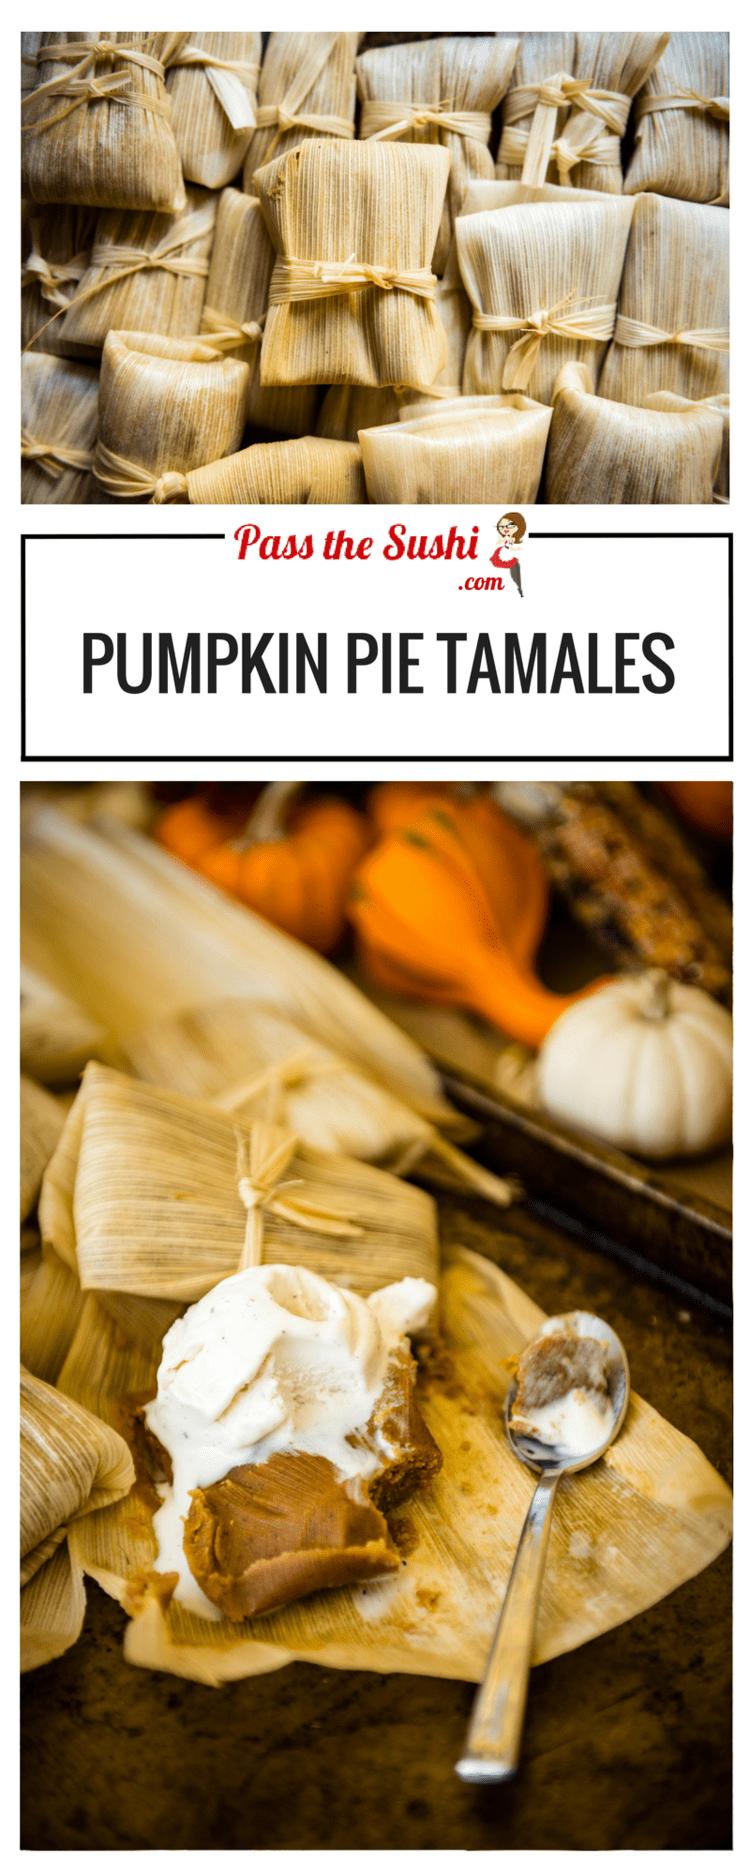 Pumpkin Pie Tamales | Recipe at PasstheSushi.com